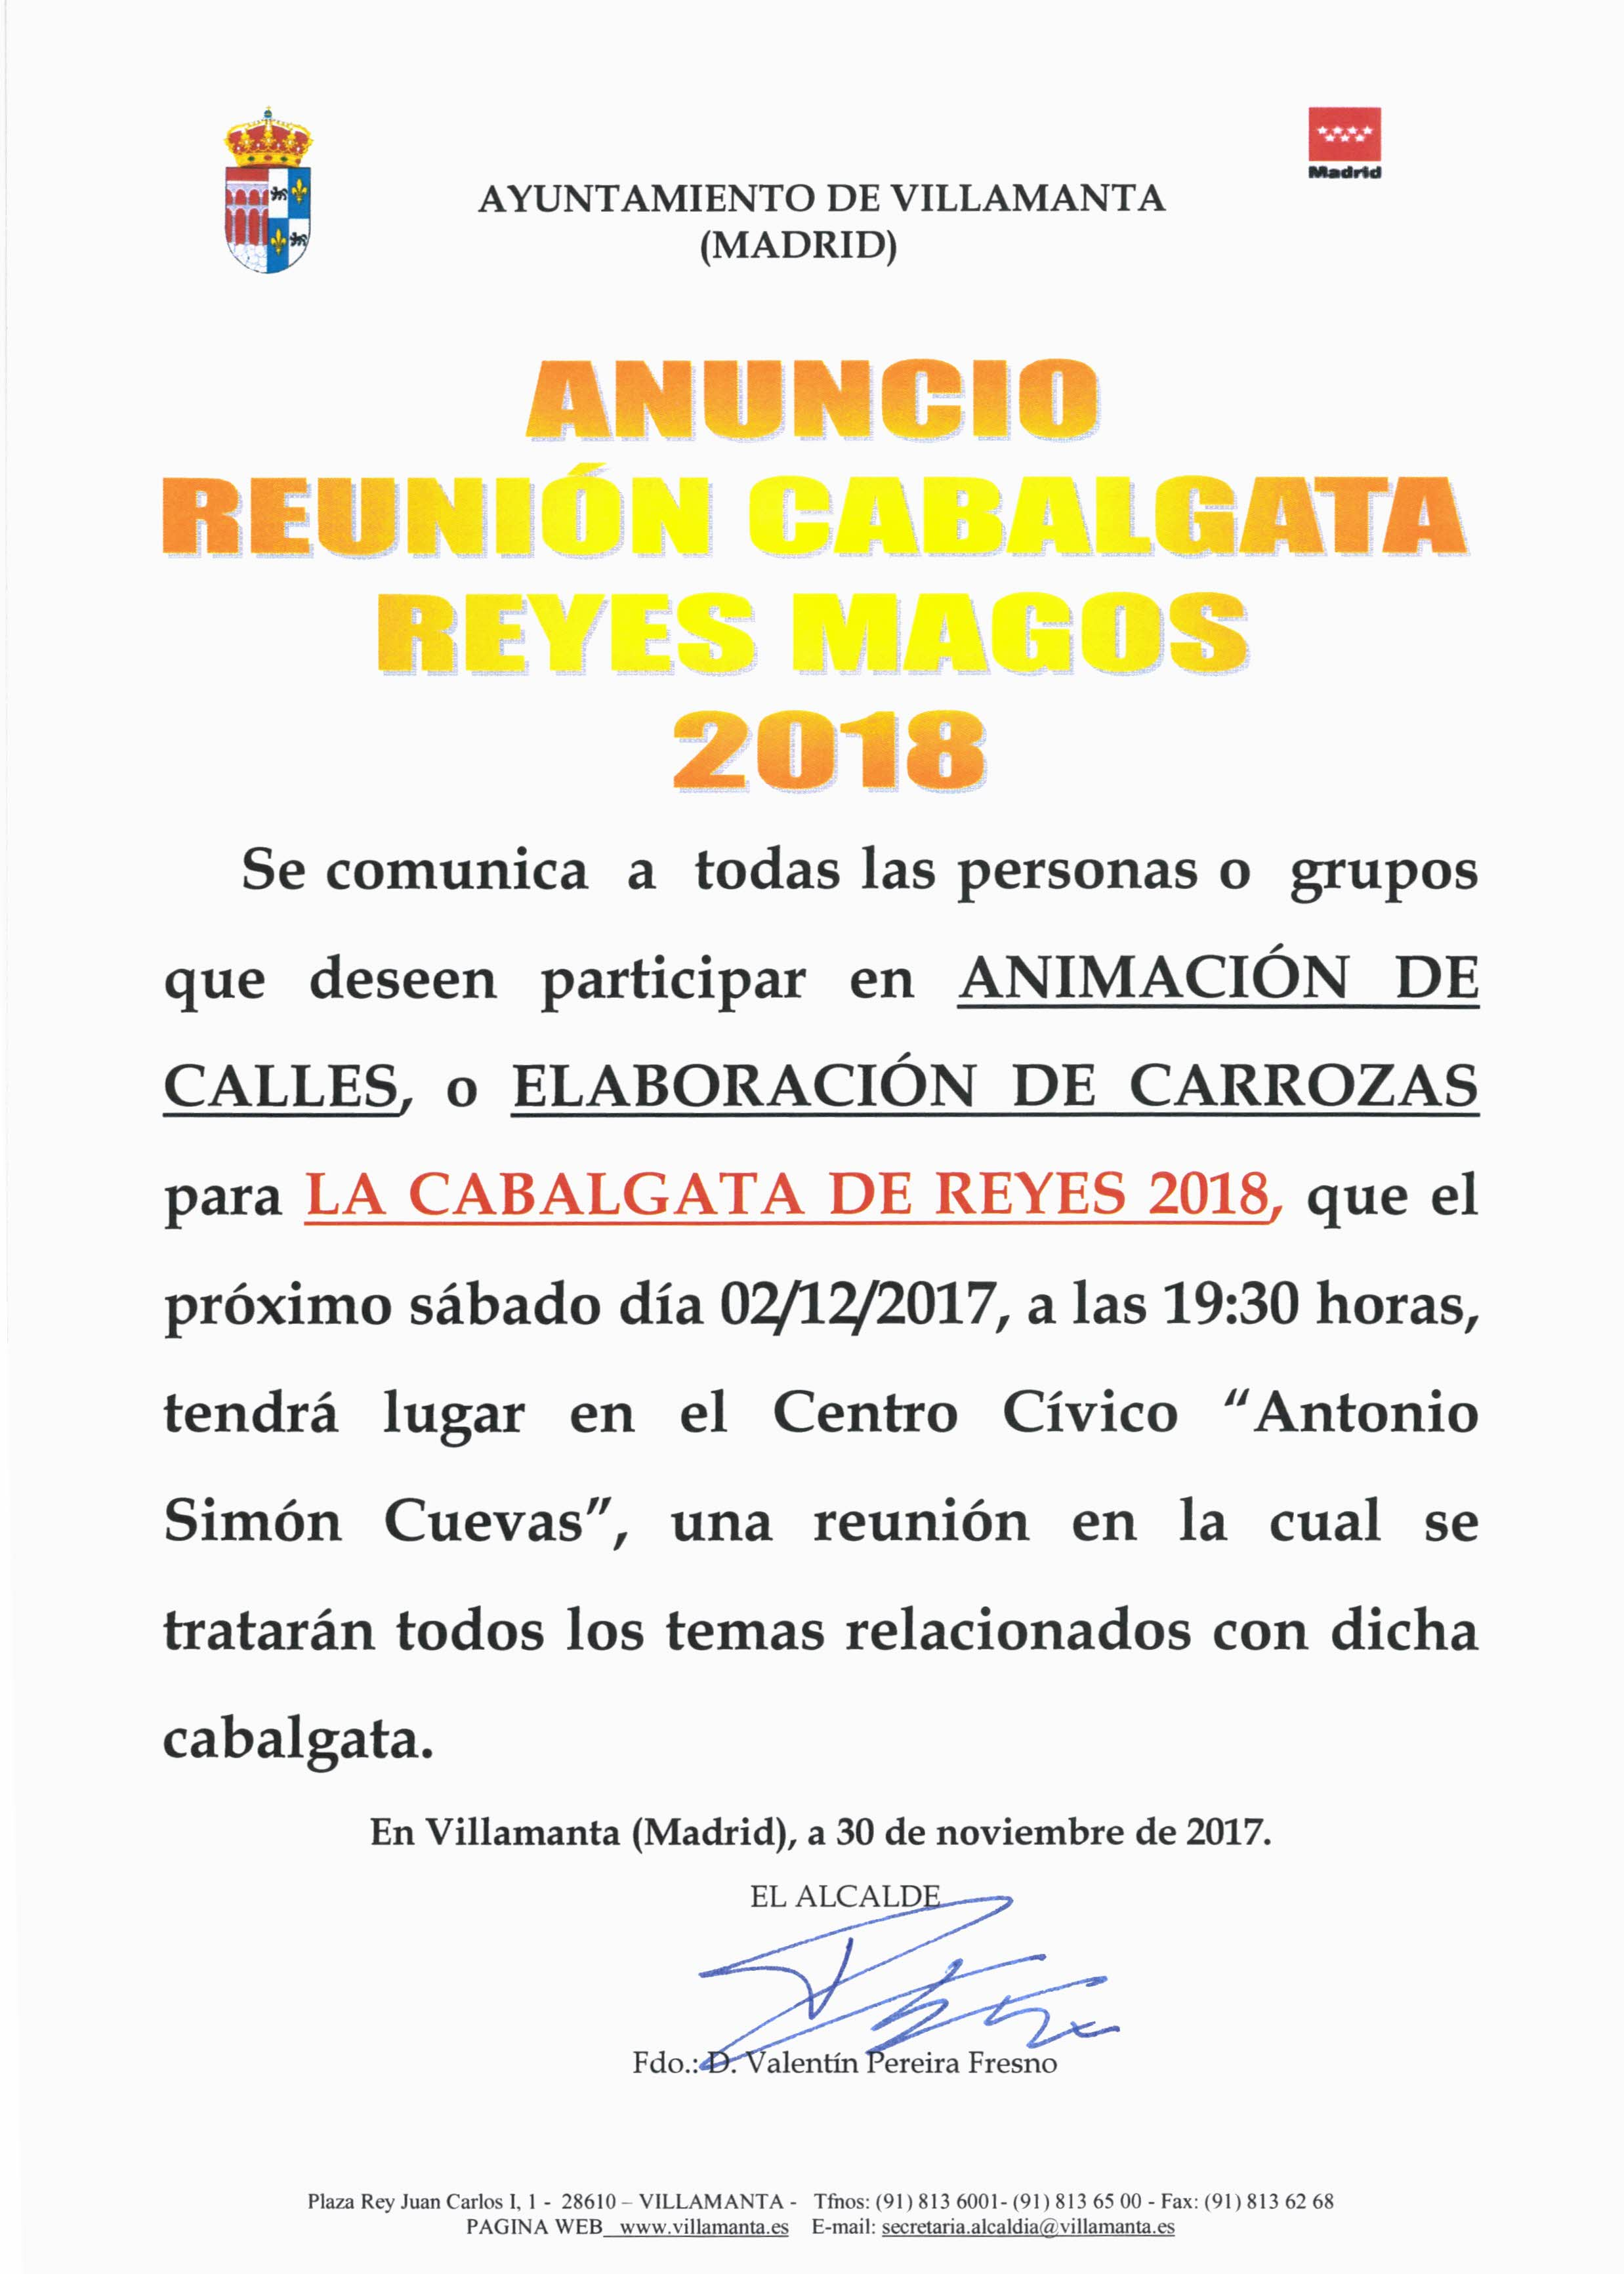 Anuncio Cabalgata de Reyes Magos 2018